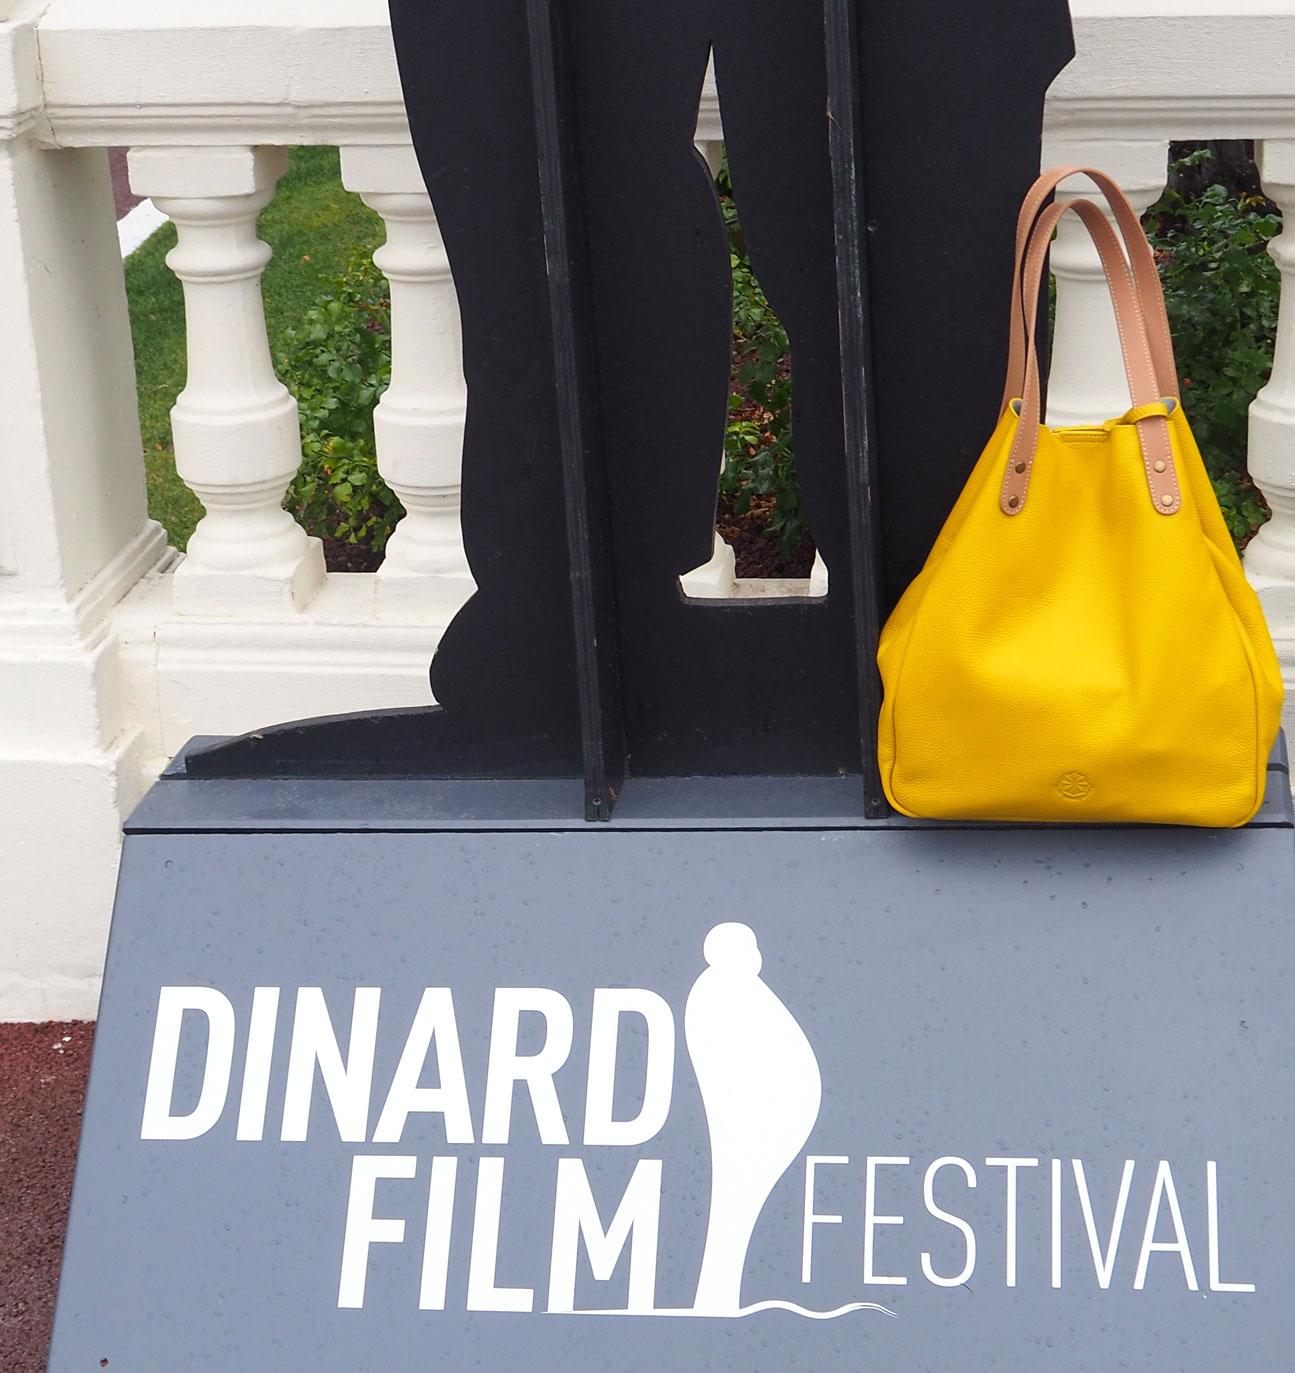 dinard-film-fest